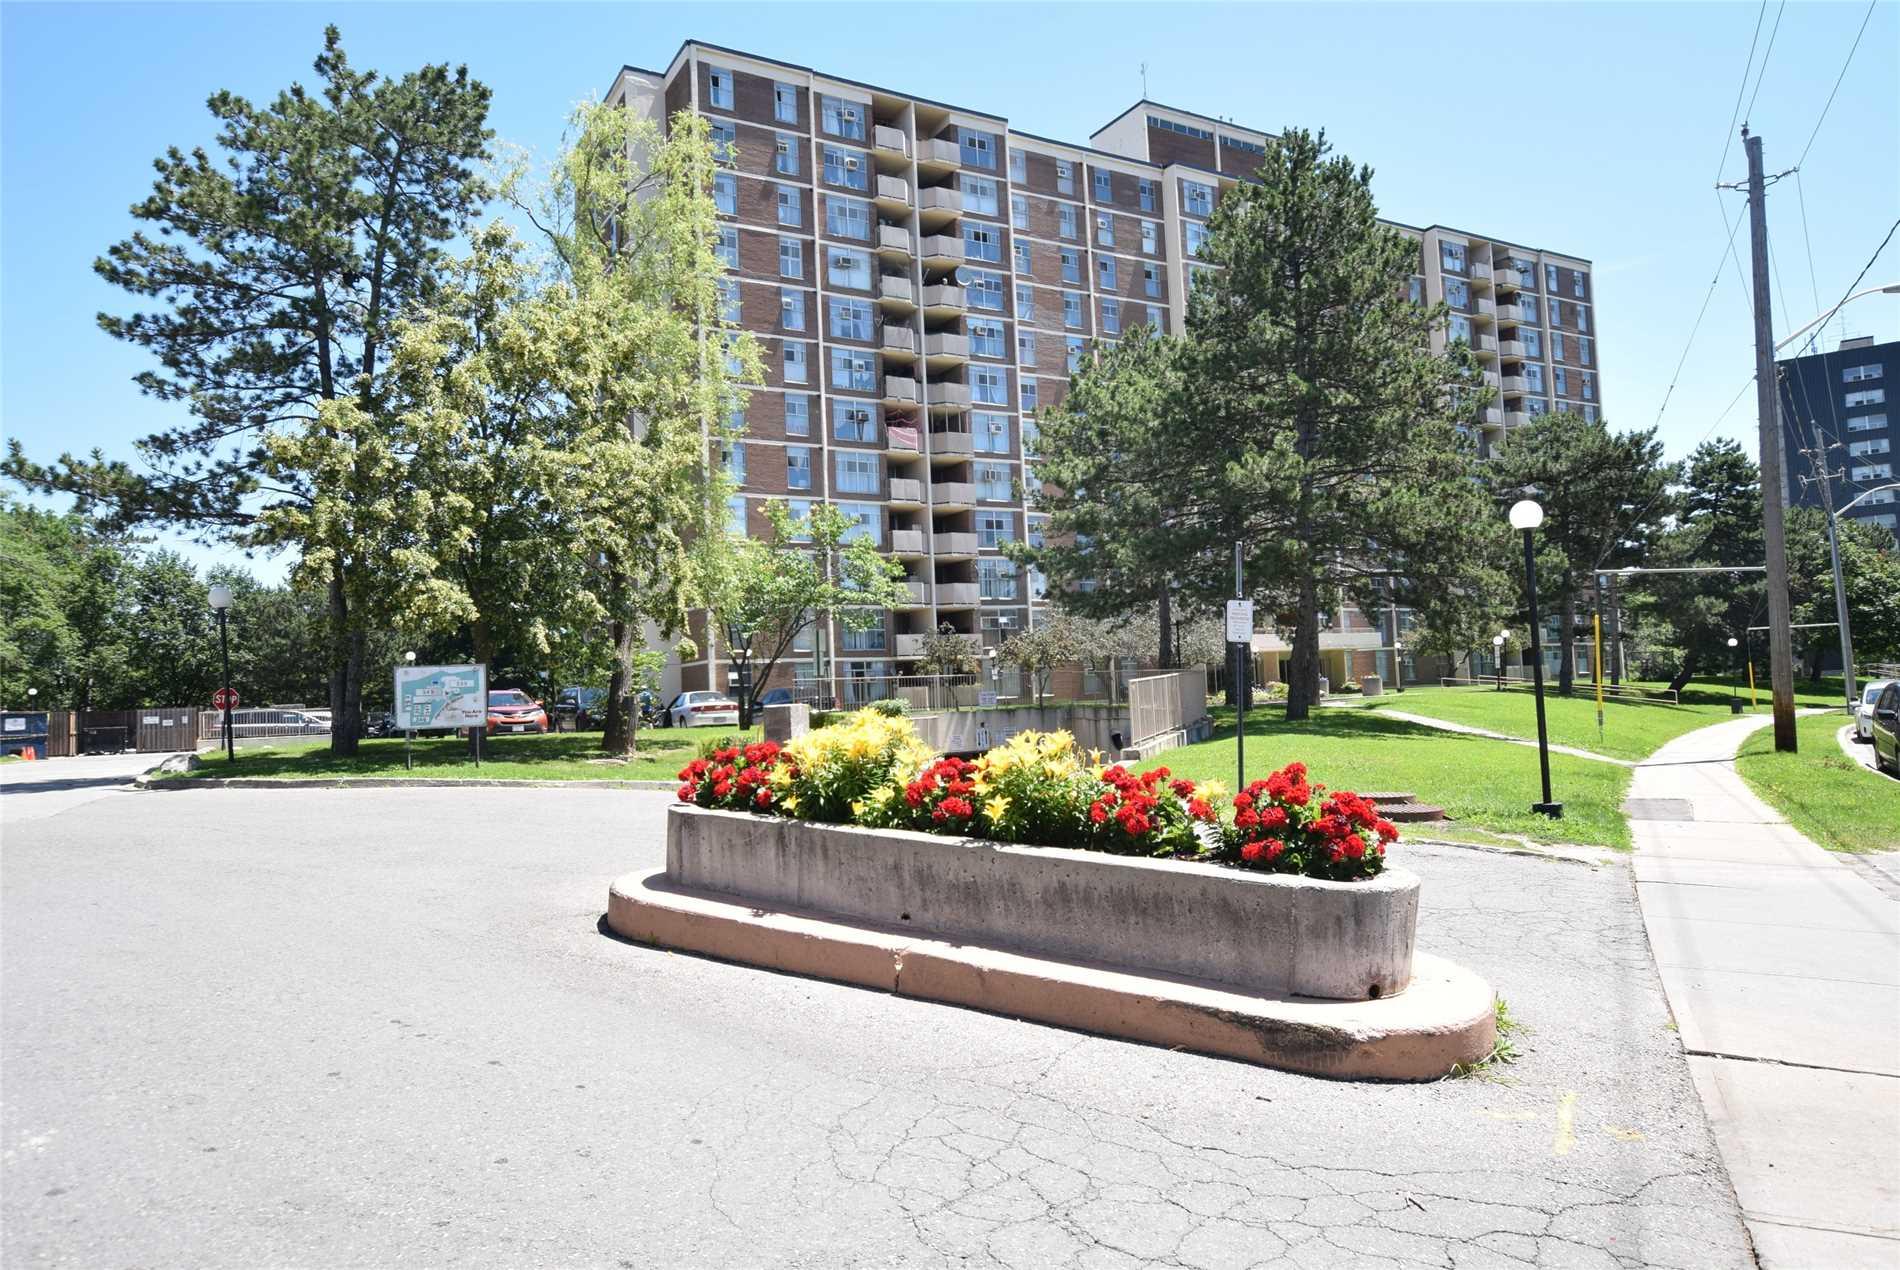 Buliding: 335 Driftwood Avenue, Toronto, ON